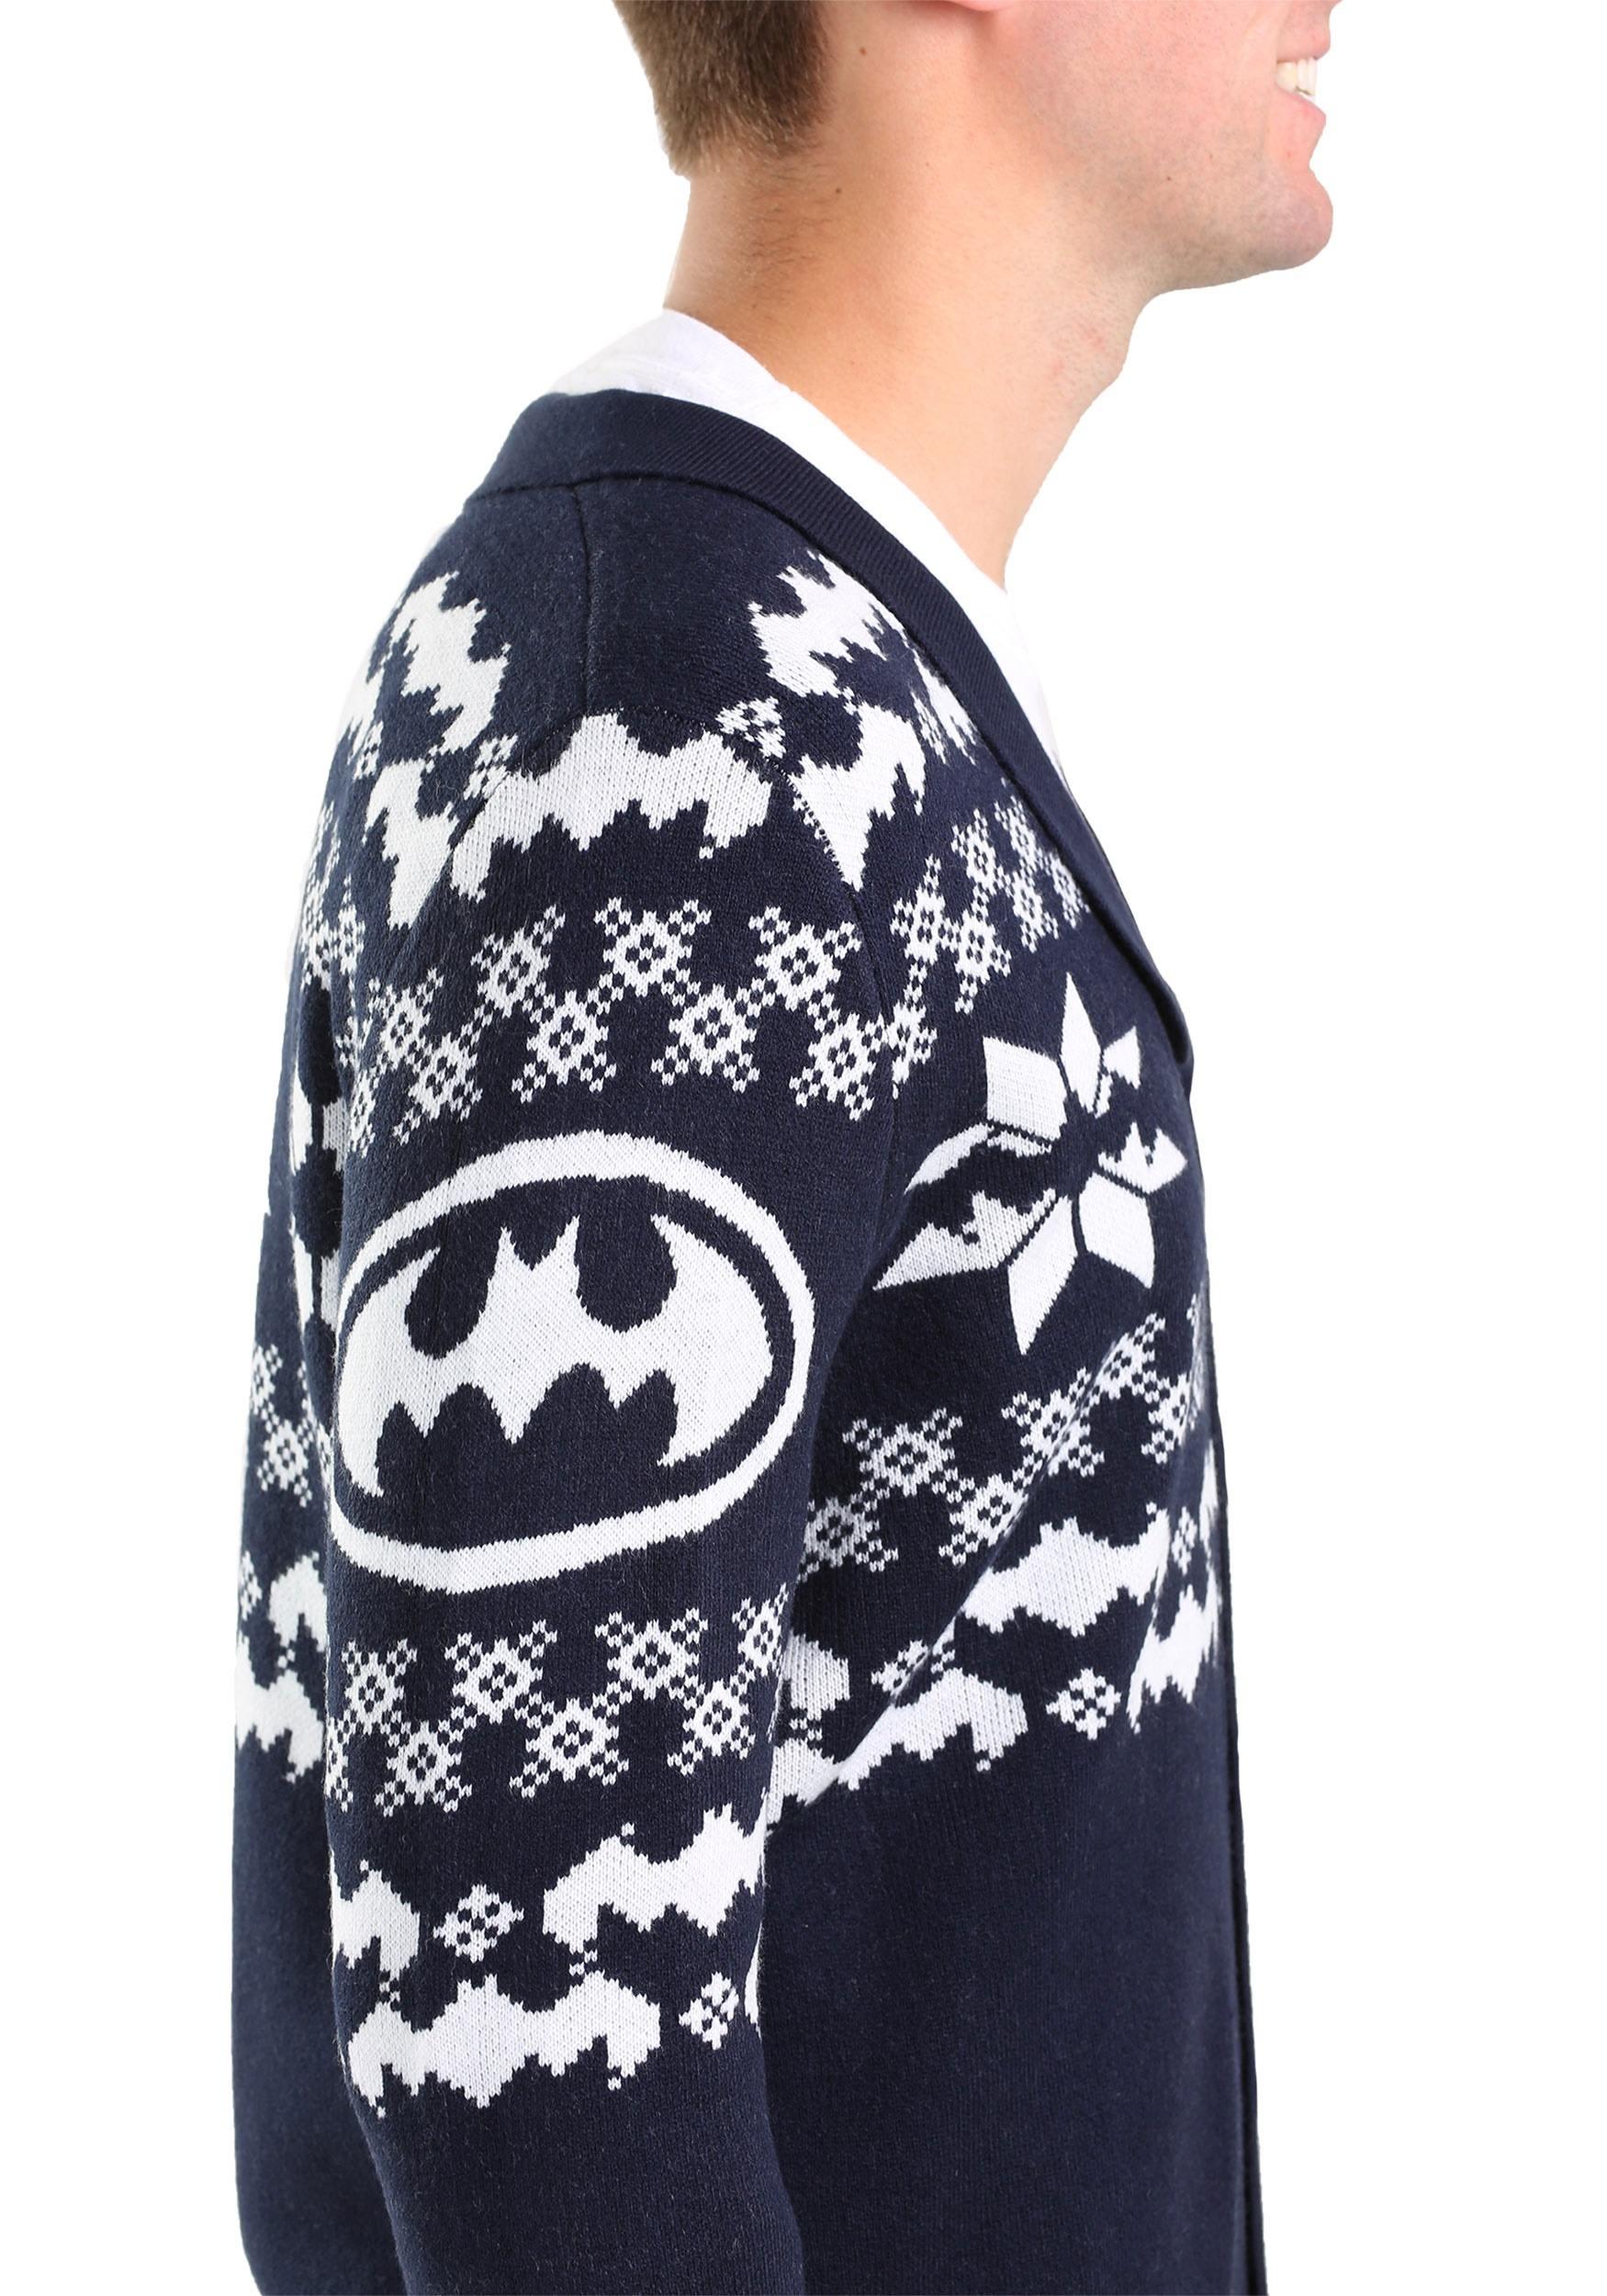 Batman Ugly Christmas Cardigan for Men